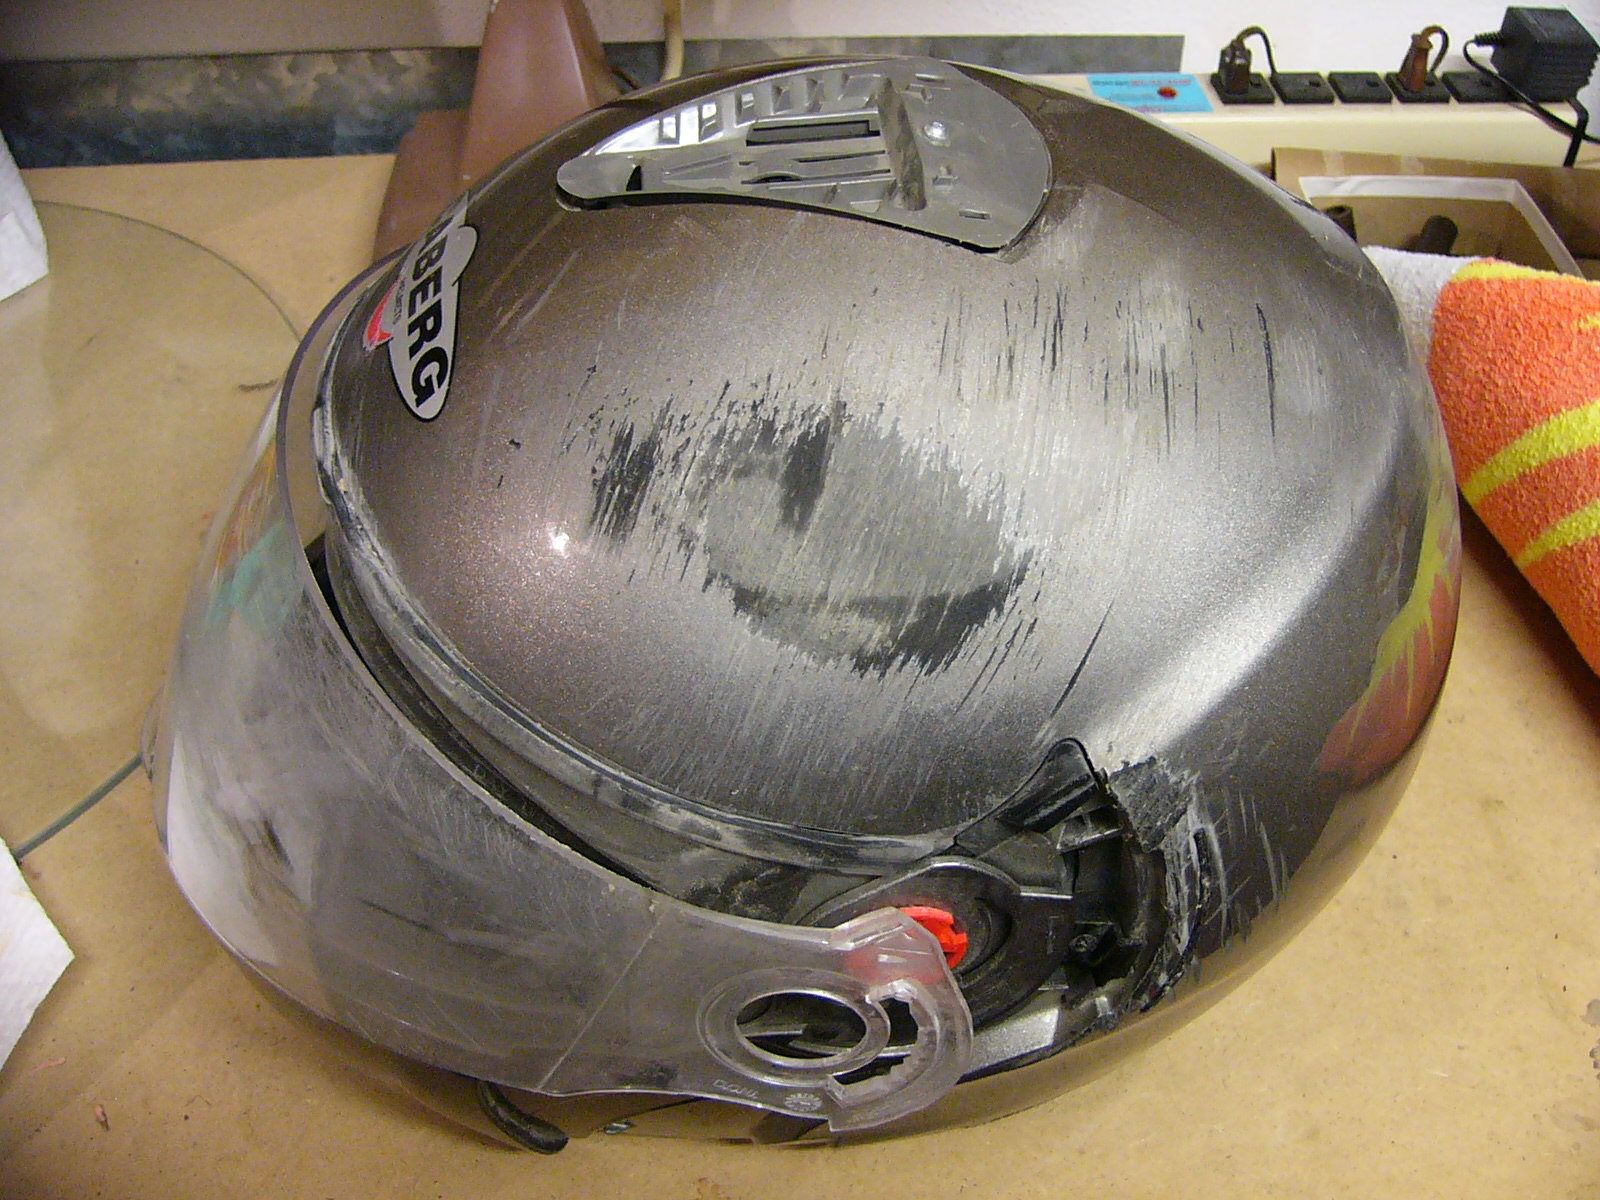 My Bmw Usa >> Gear crash test - Caberg Justissimo helmet - Ducati.ms - The Ultimate Ducati Forum